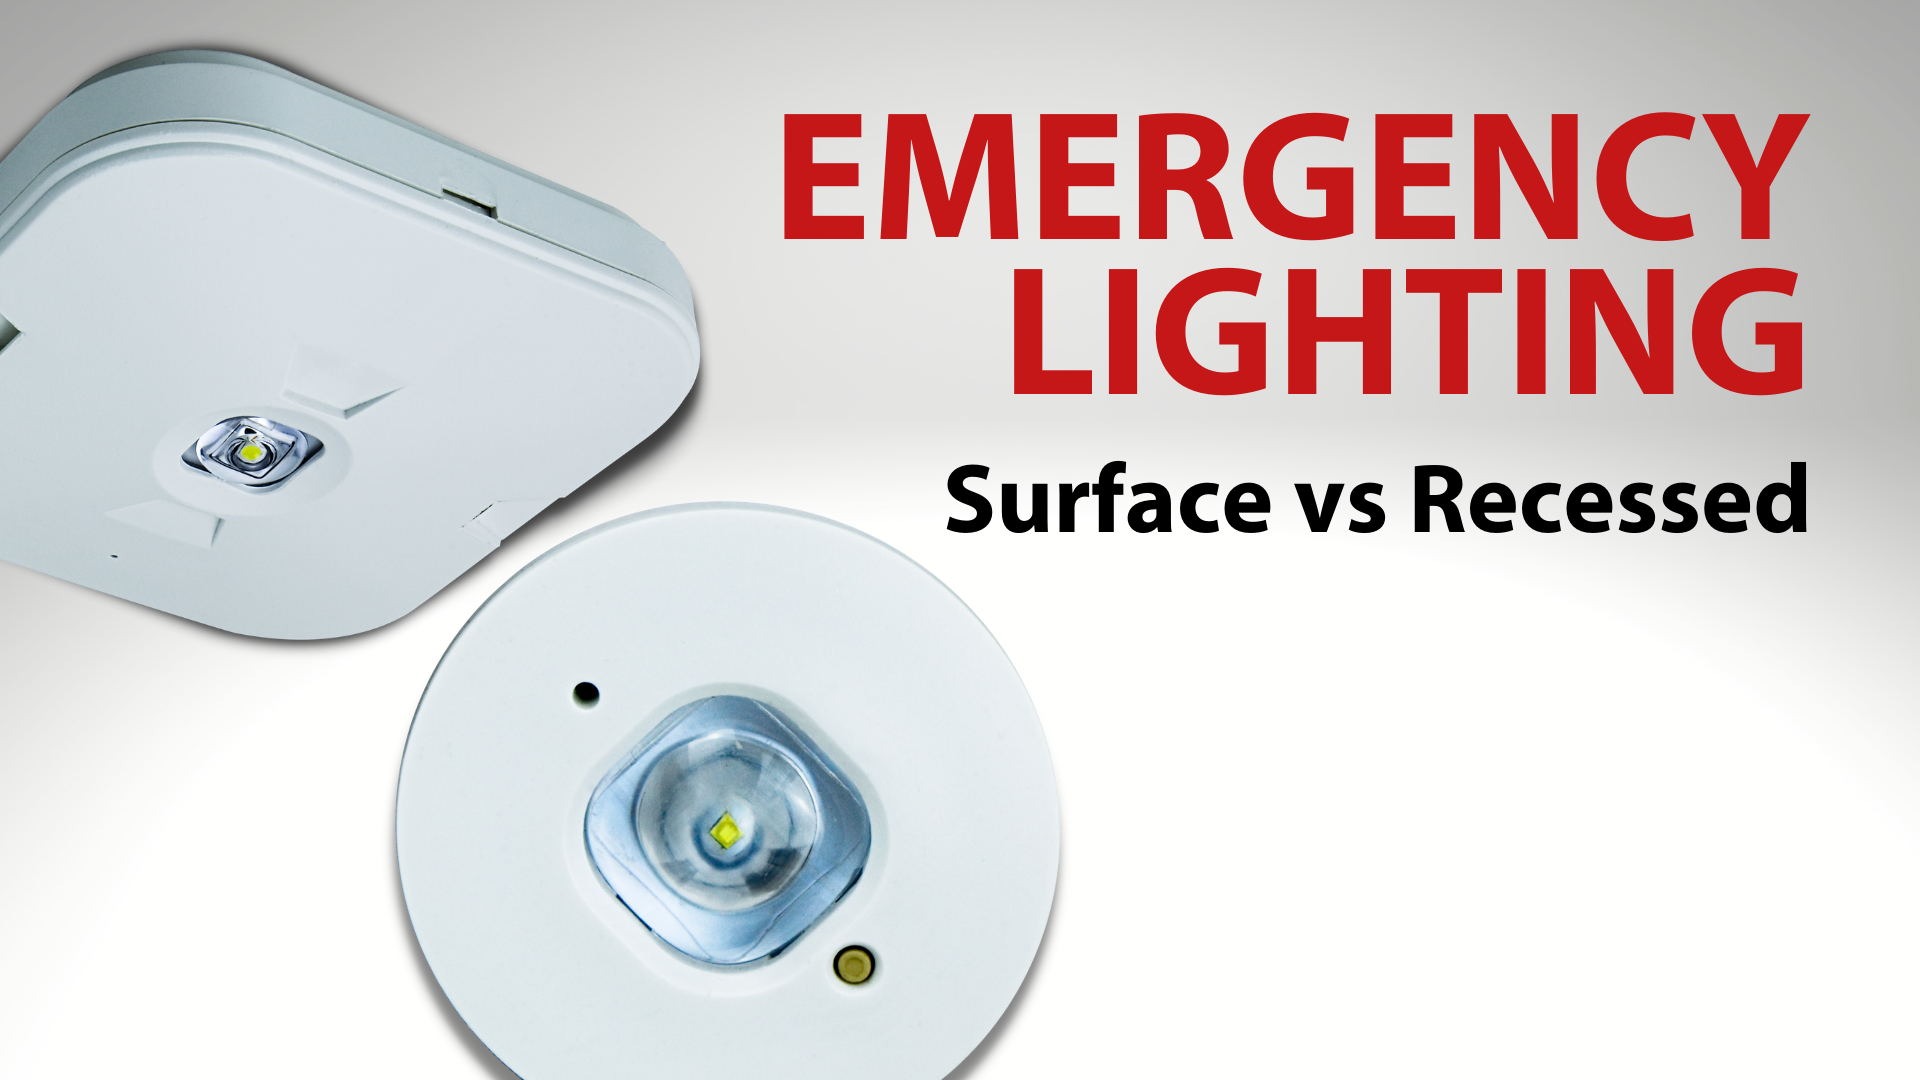 Emergency lighting: surface vs recessed